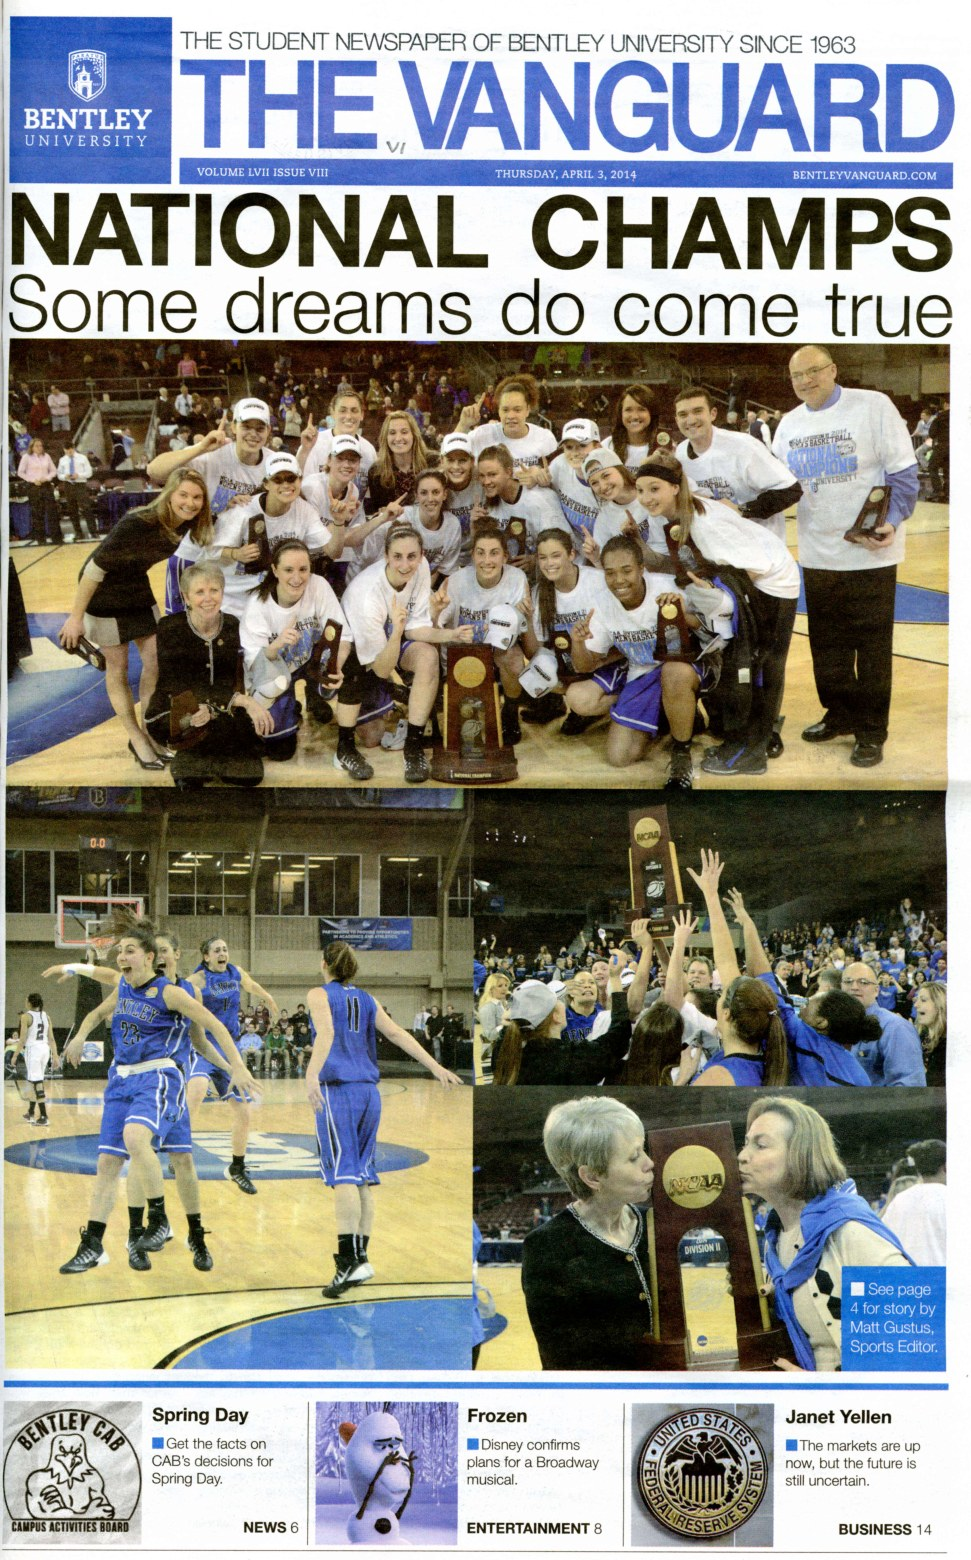 Athletics_Basketball_W_Champs_2014_smallerjpg